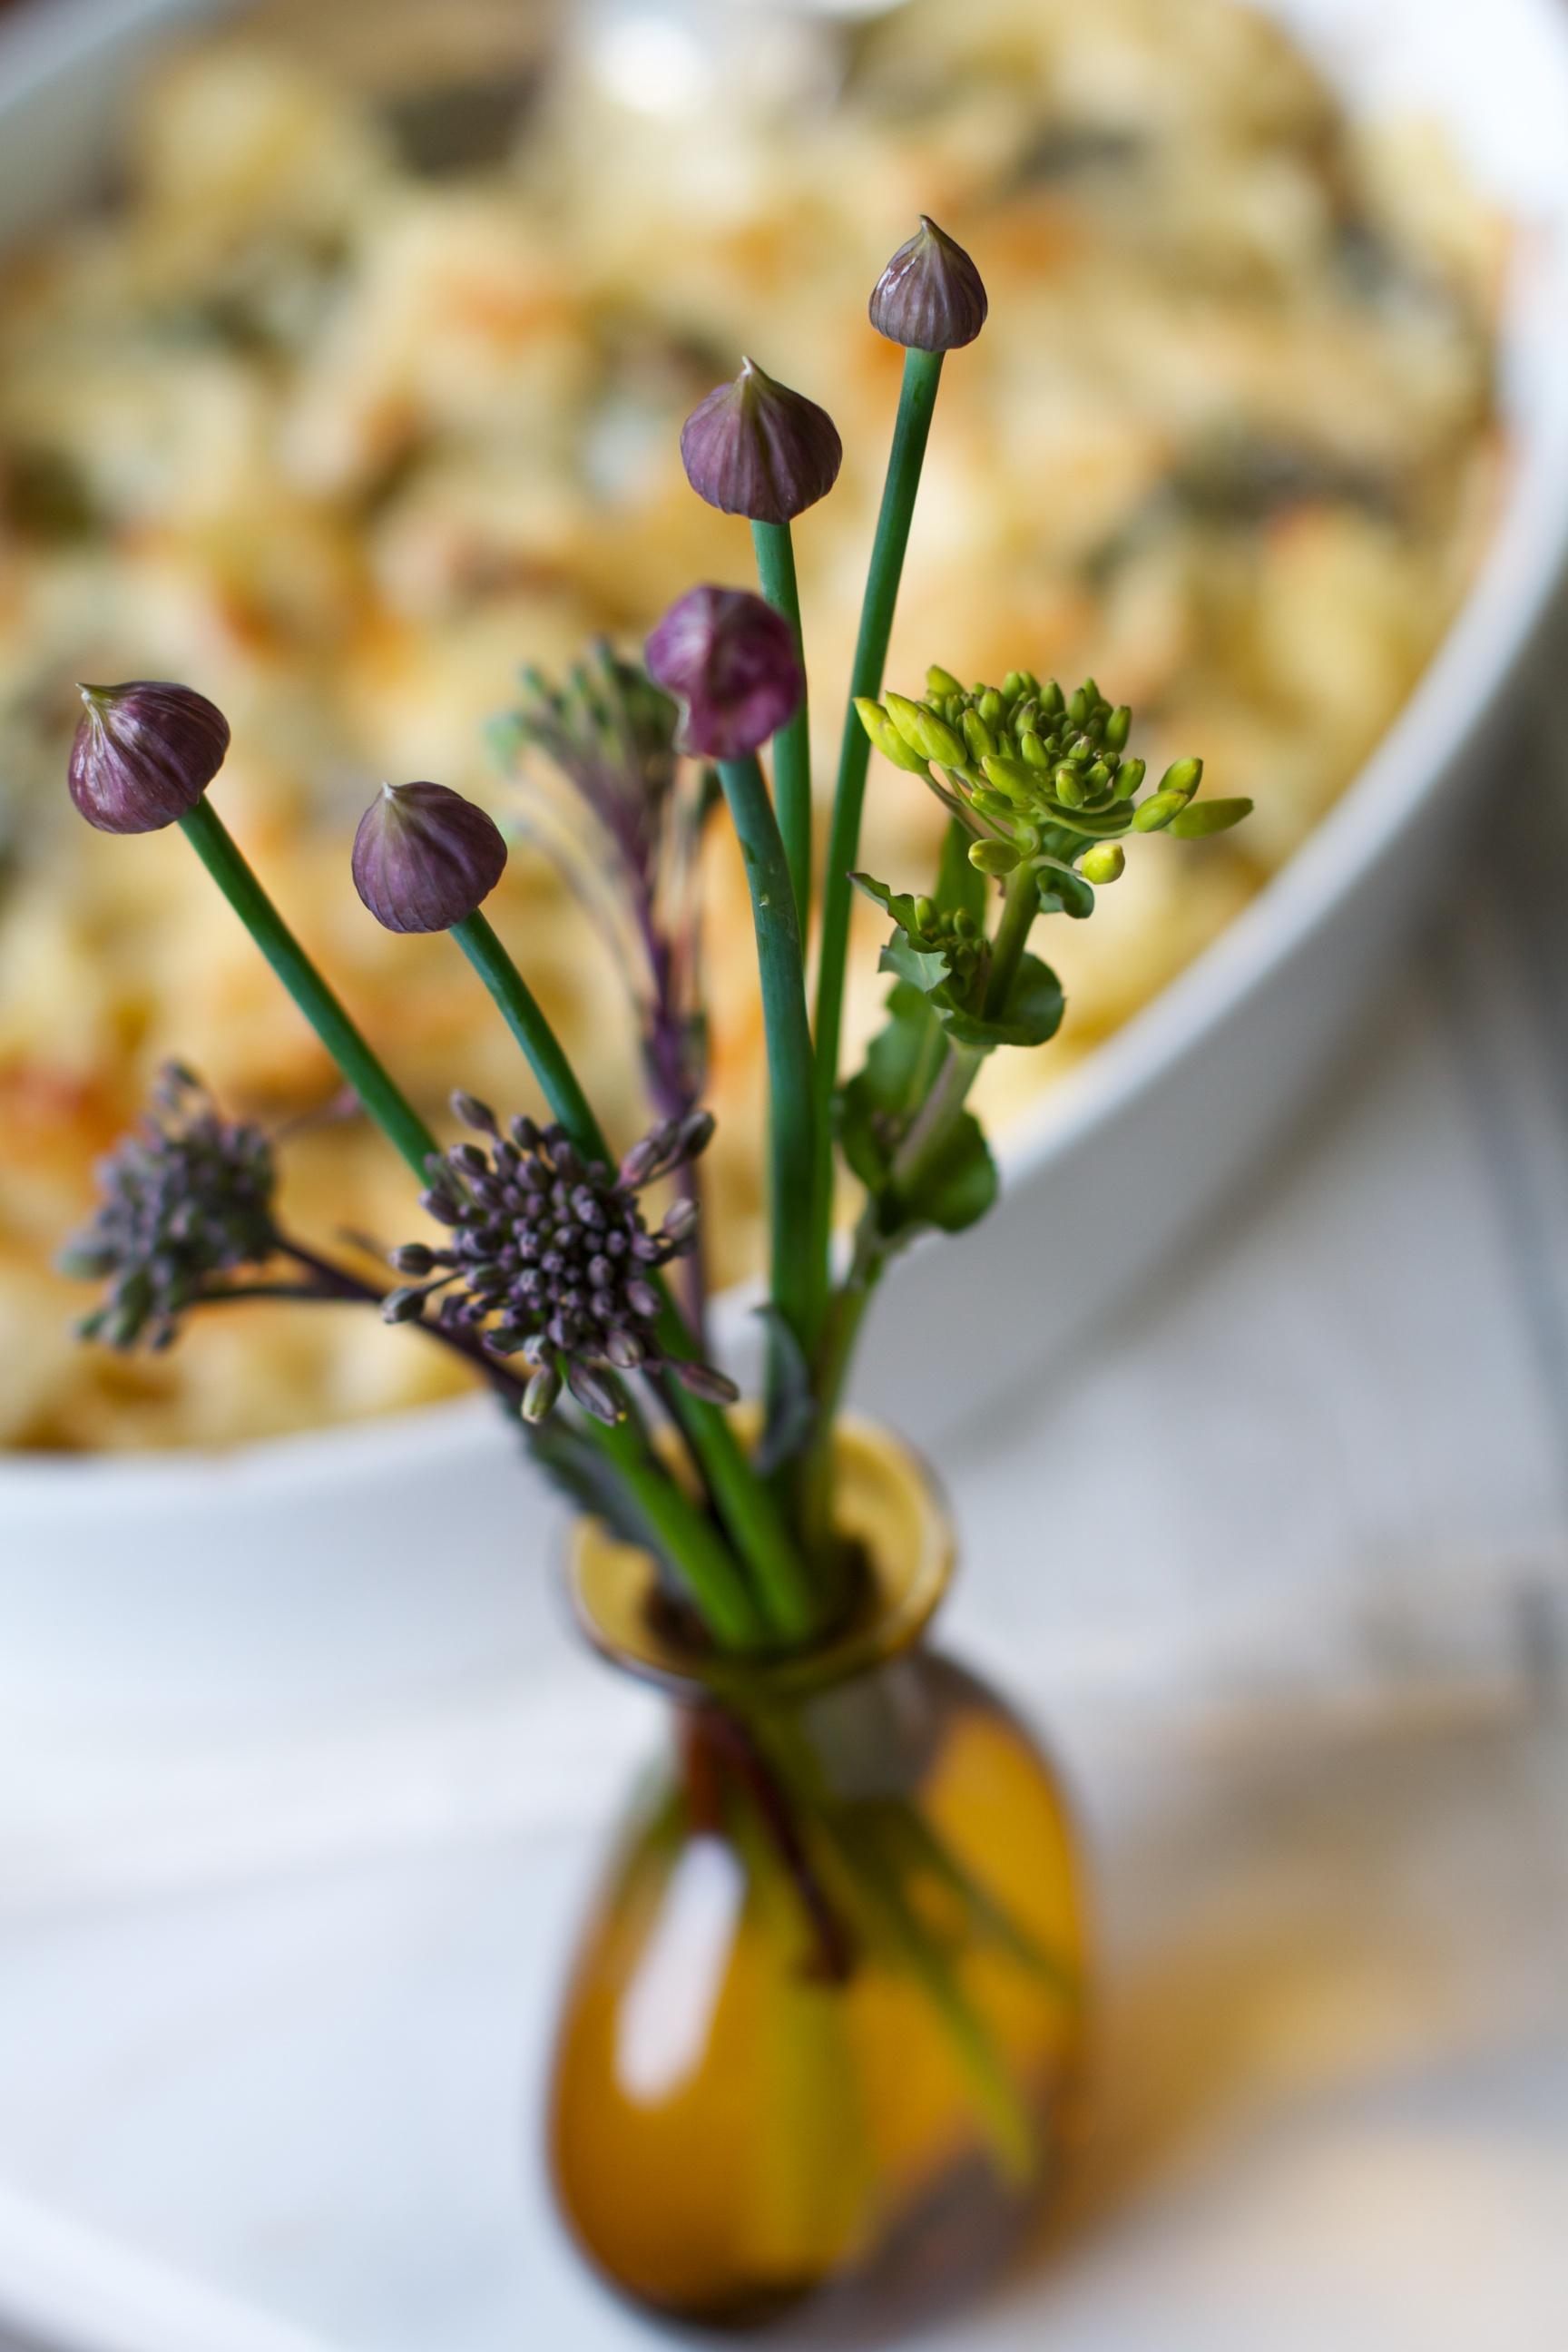 Brassica & chive florets